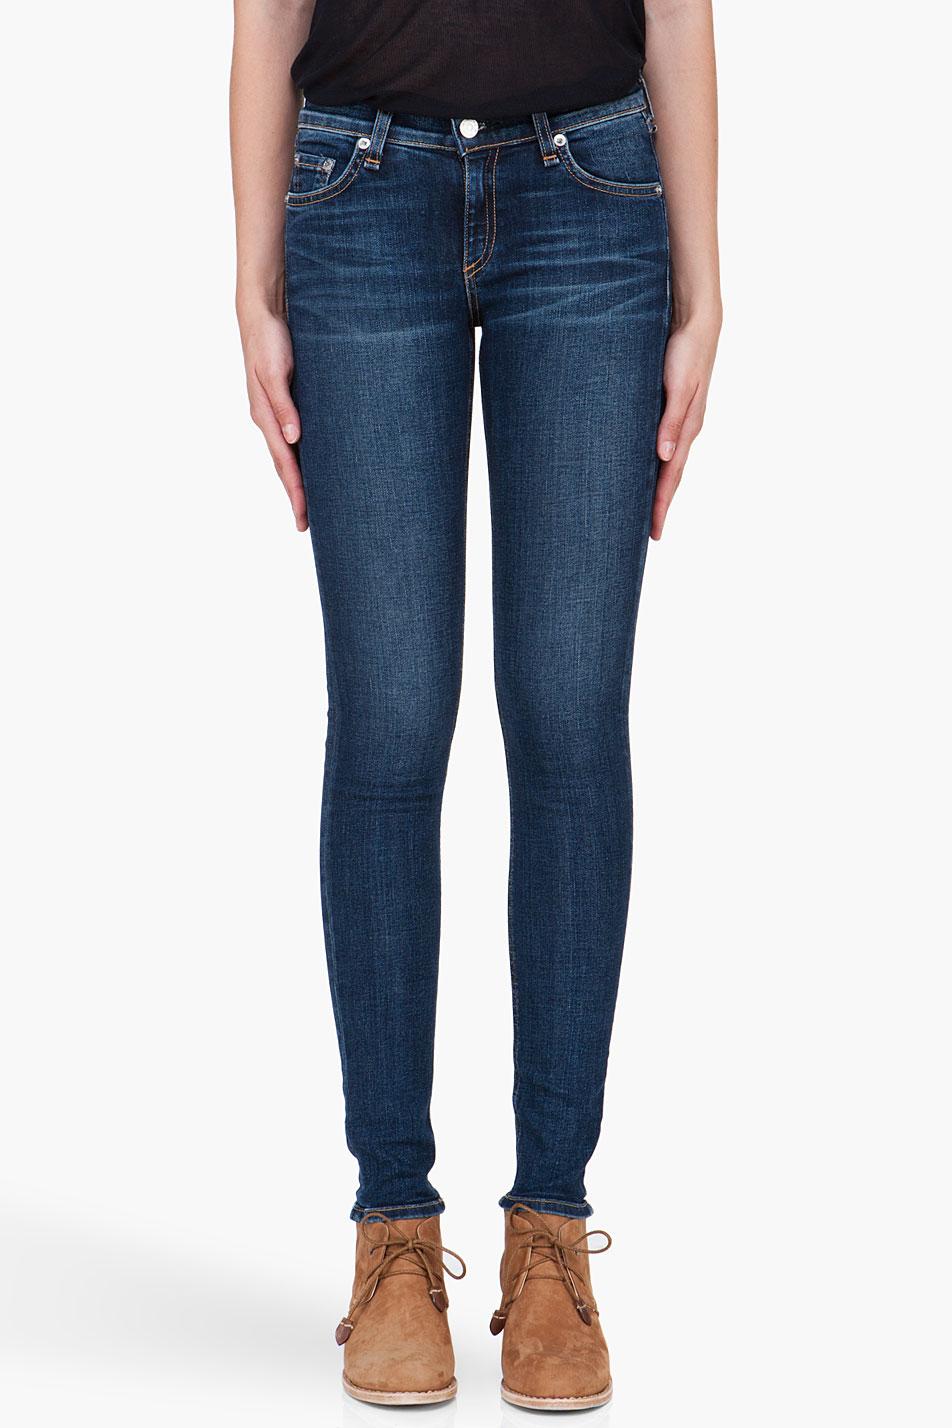 Cheap True Religion Jeans Womens